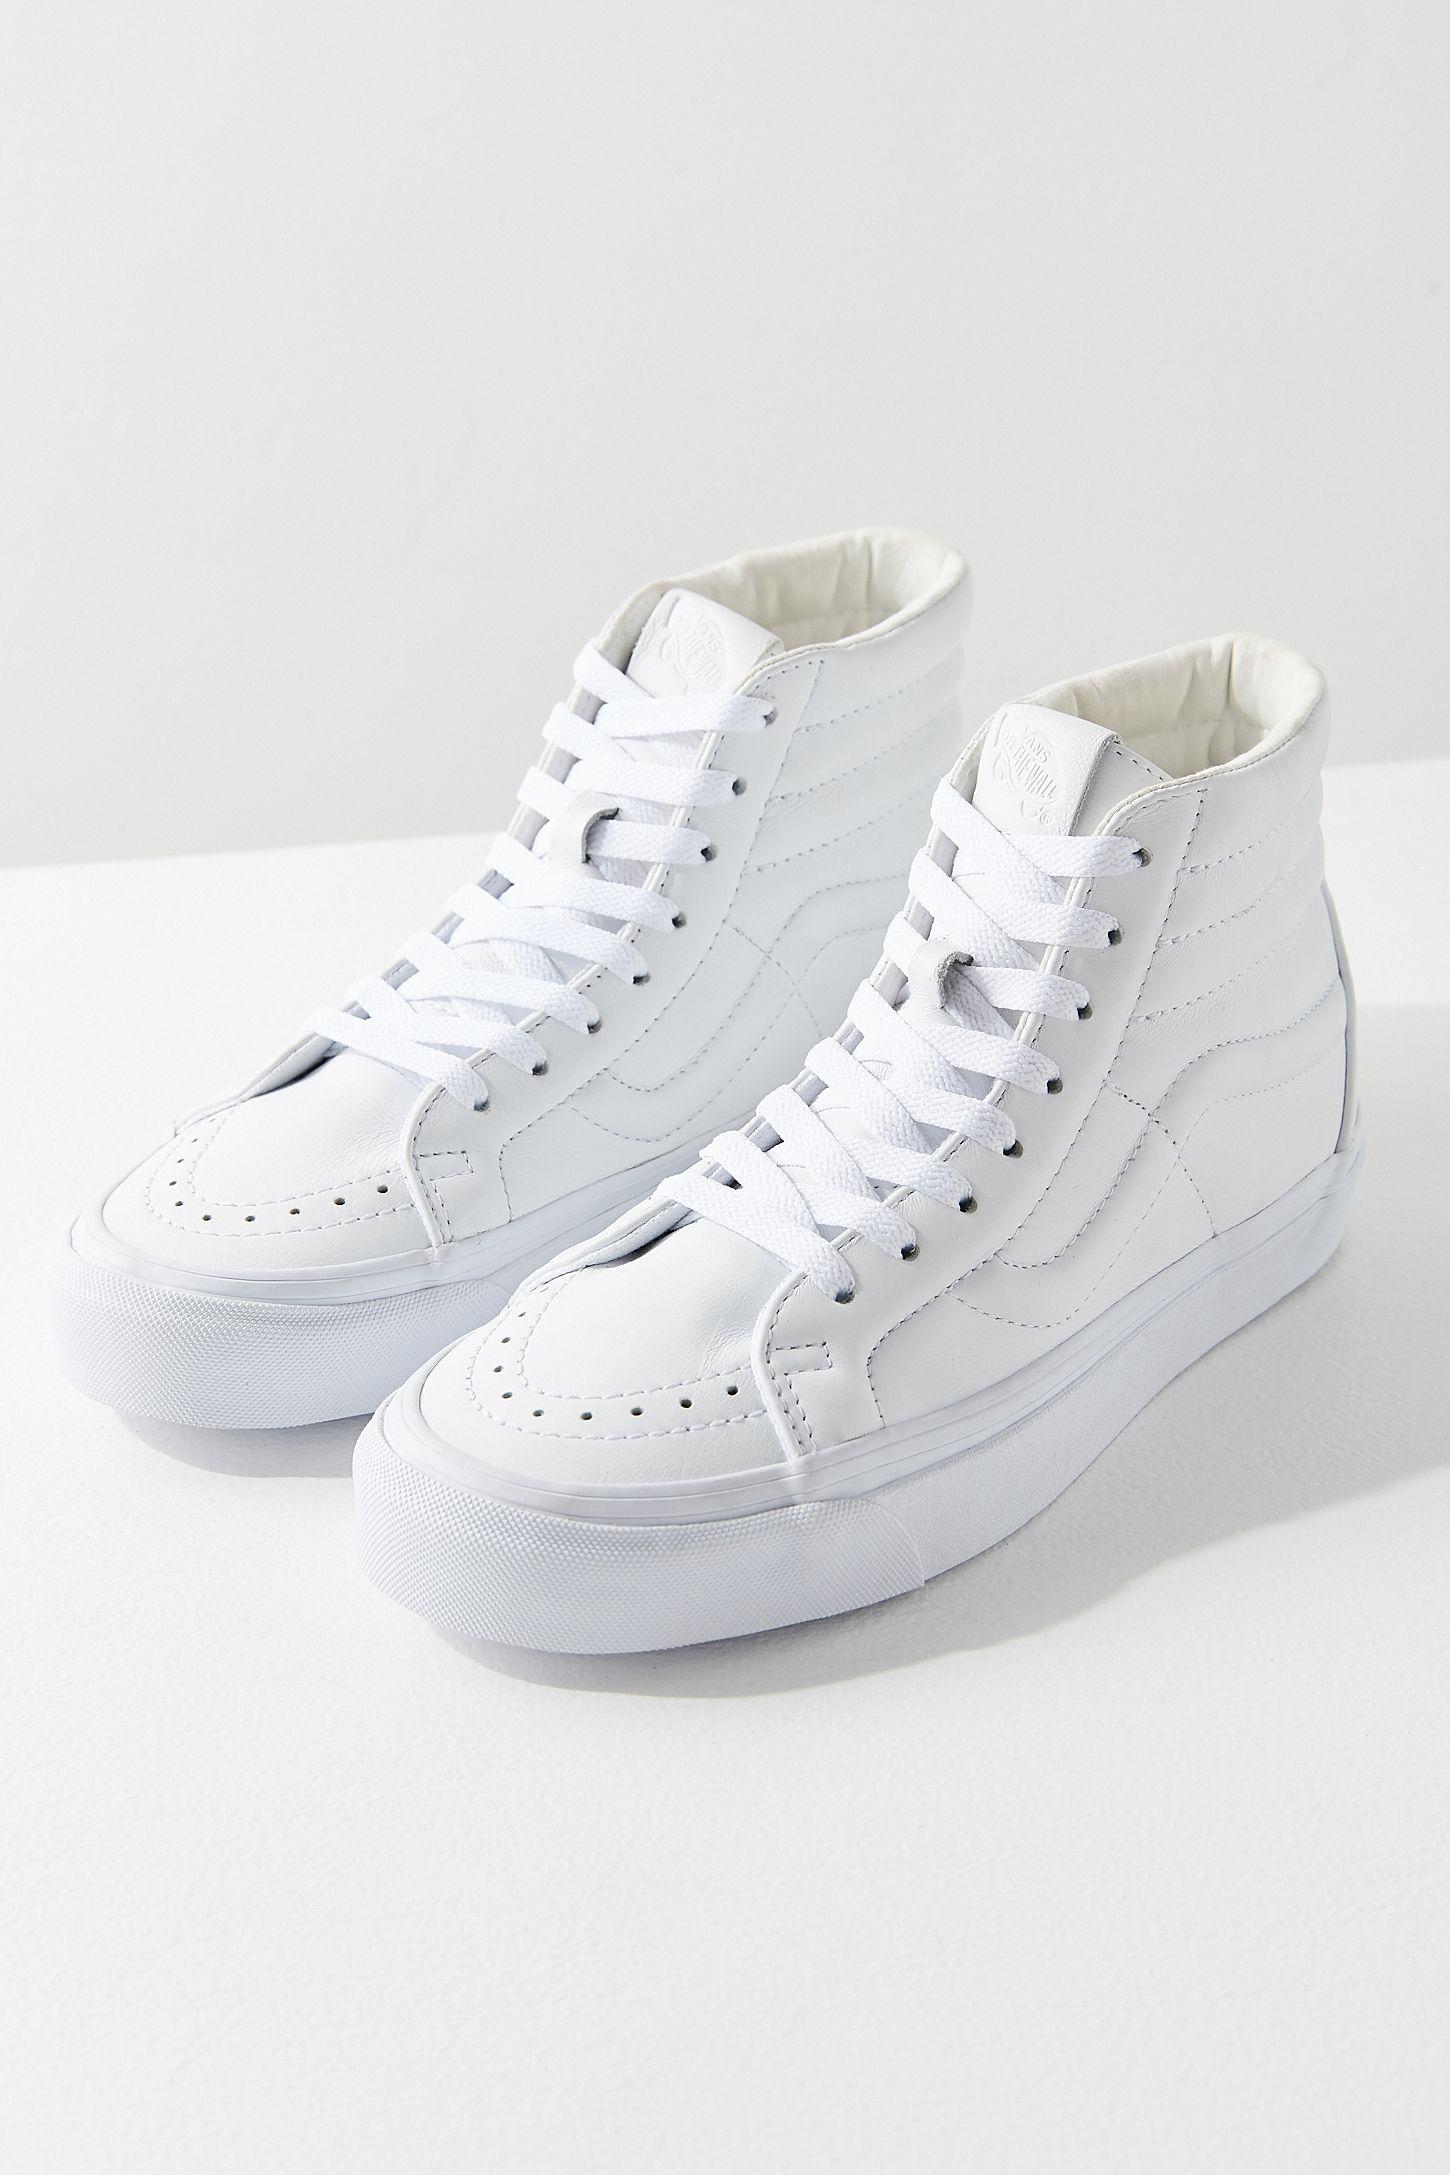 Vans Sk8-Hi Reissue Leather Sneaker  9fda10989f11